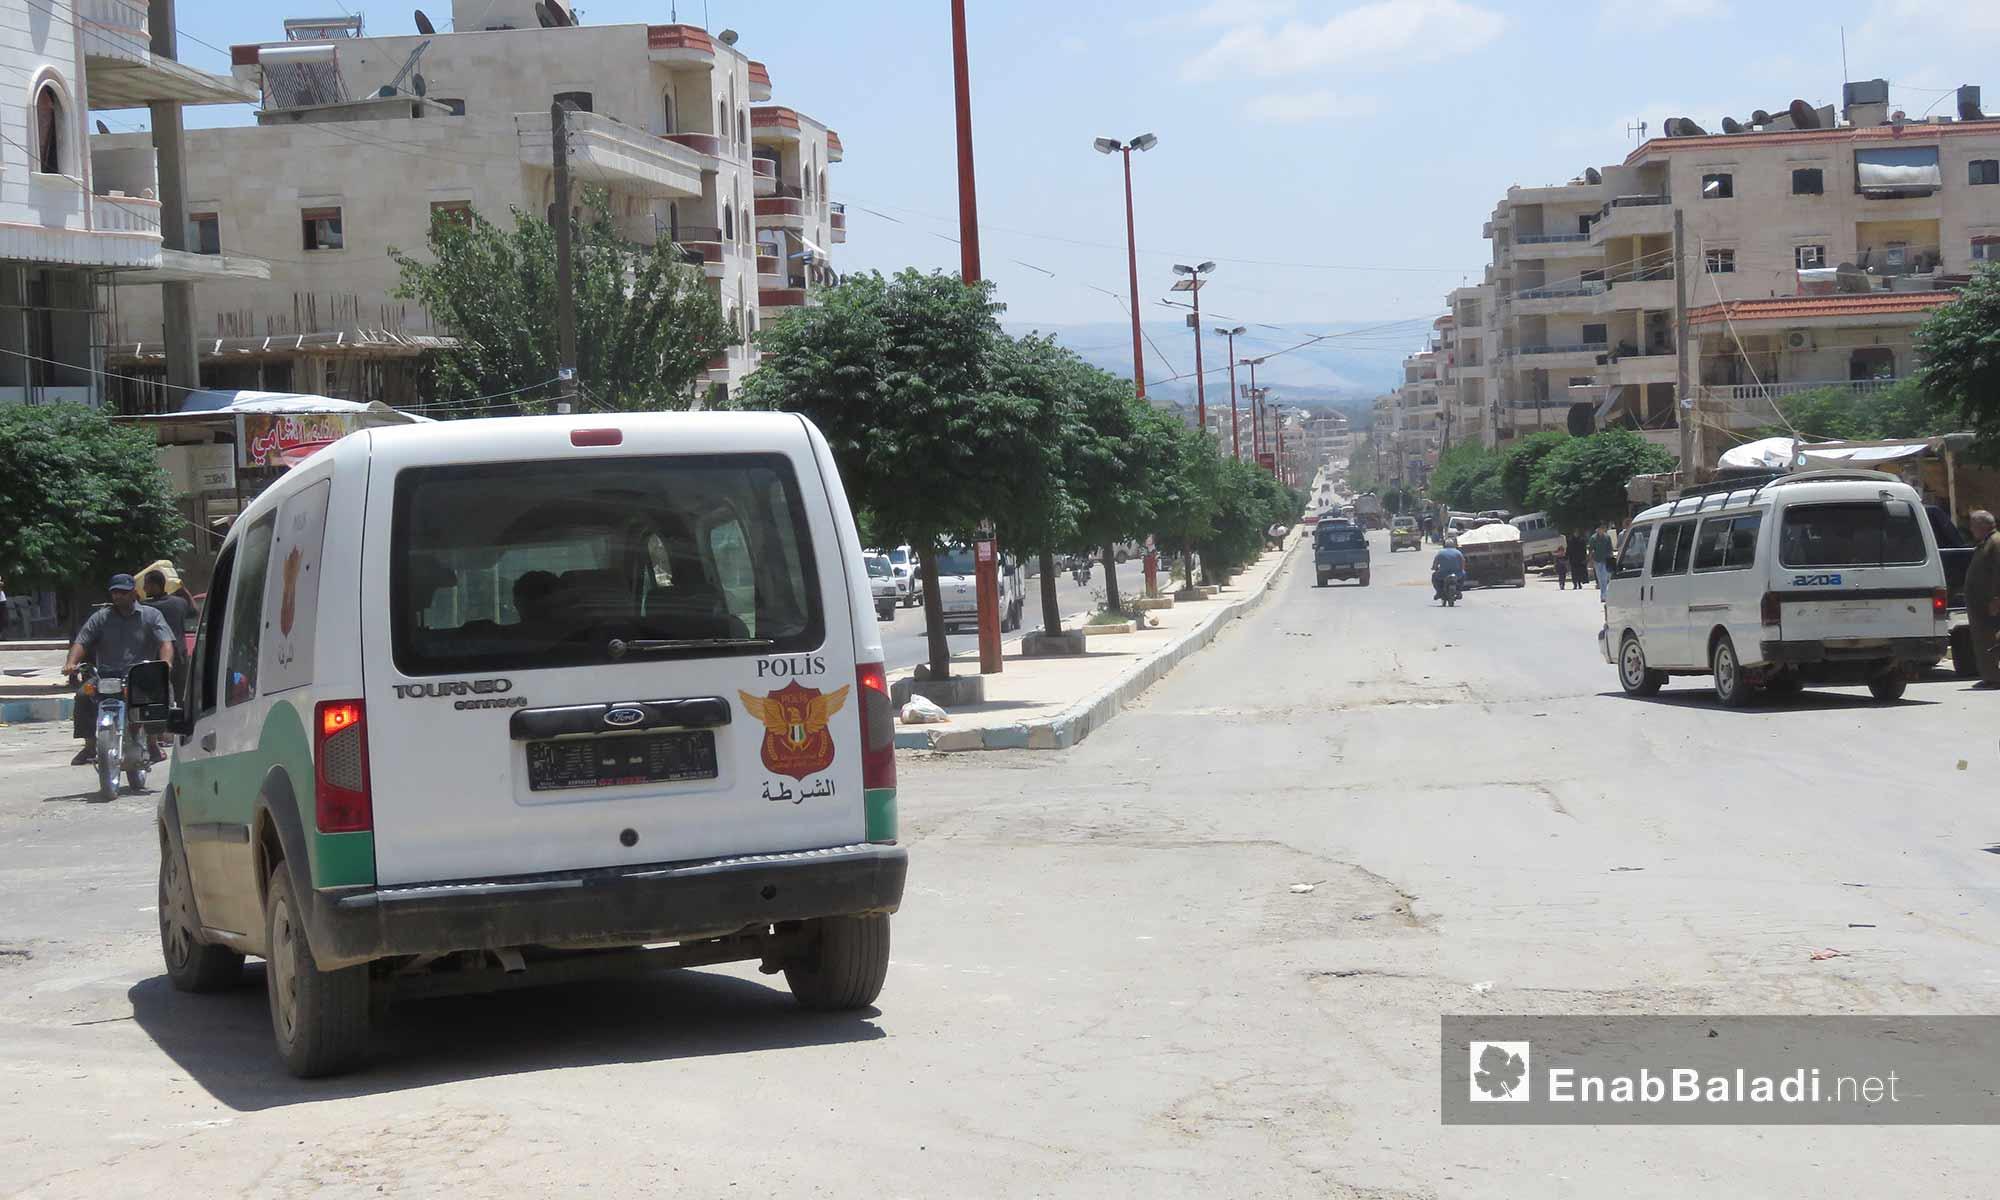 The neighborhoods of the city of Afrin, rural Aleppo- June 21, 2018 (Enab Baladi)